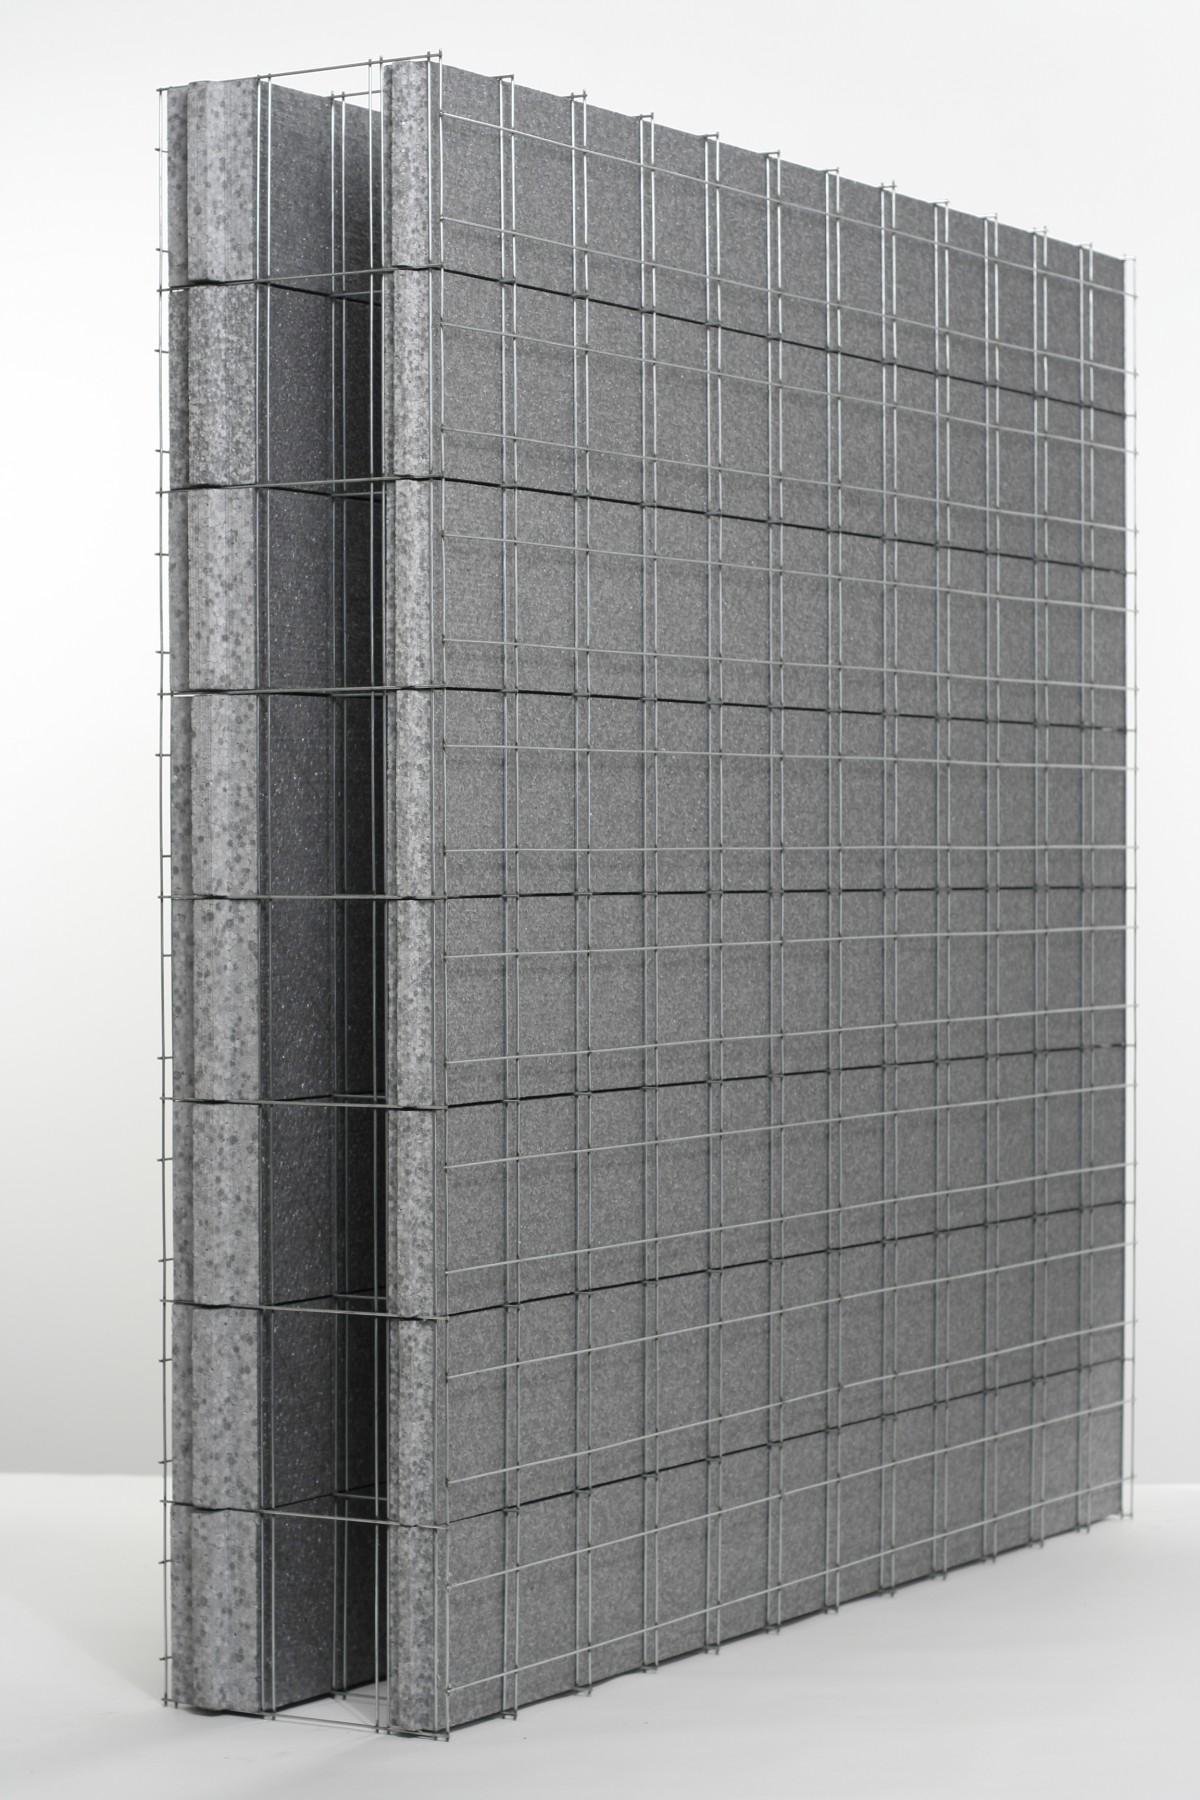 bloc coffrant isolant ibs bloc de coffrage isolant sismo. Black Bedroom Furniture Sets. Home Design Ideas